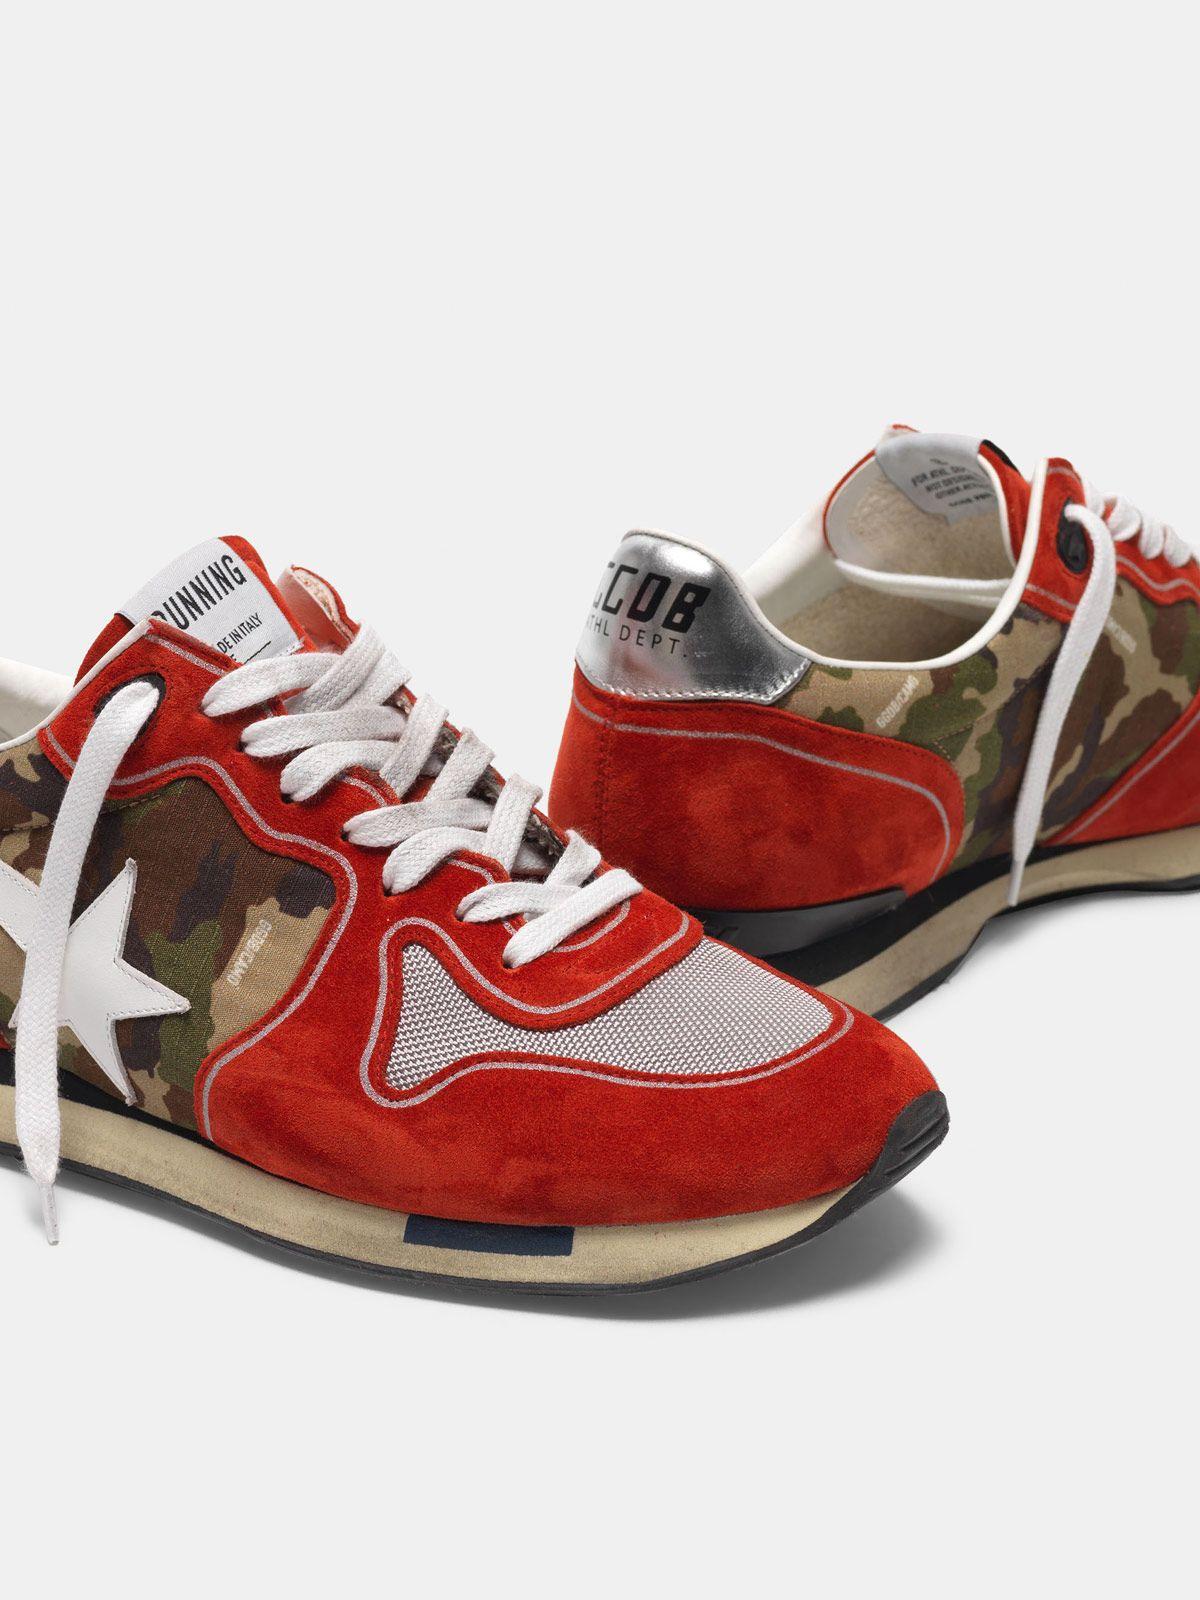 Golden Goose - Sneakers Running rosse in suede e motivo camouflage in